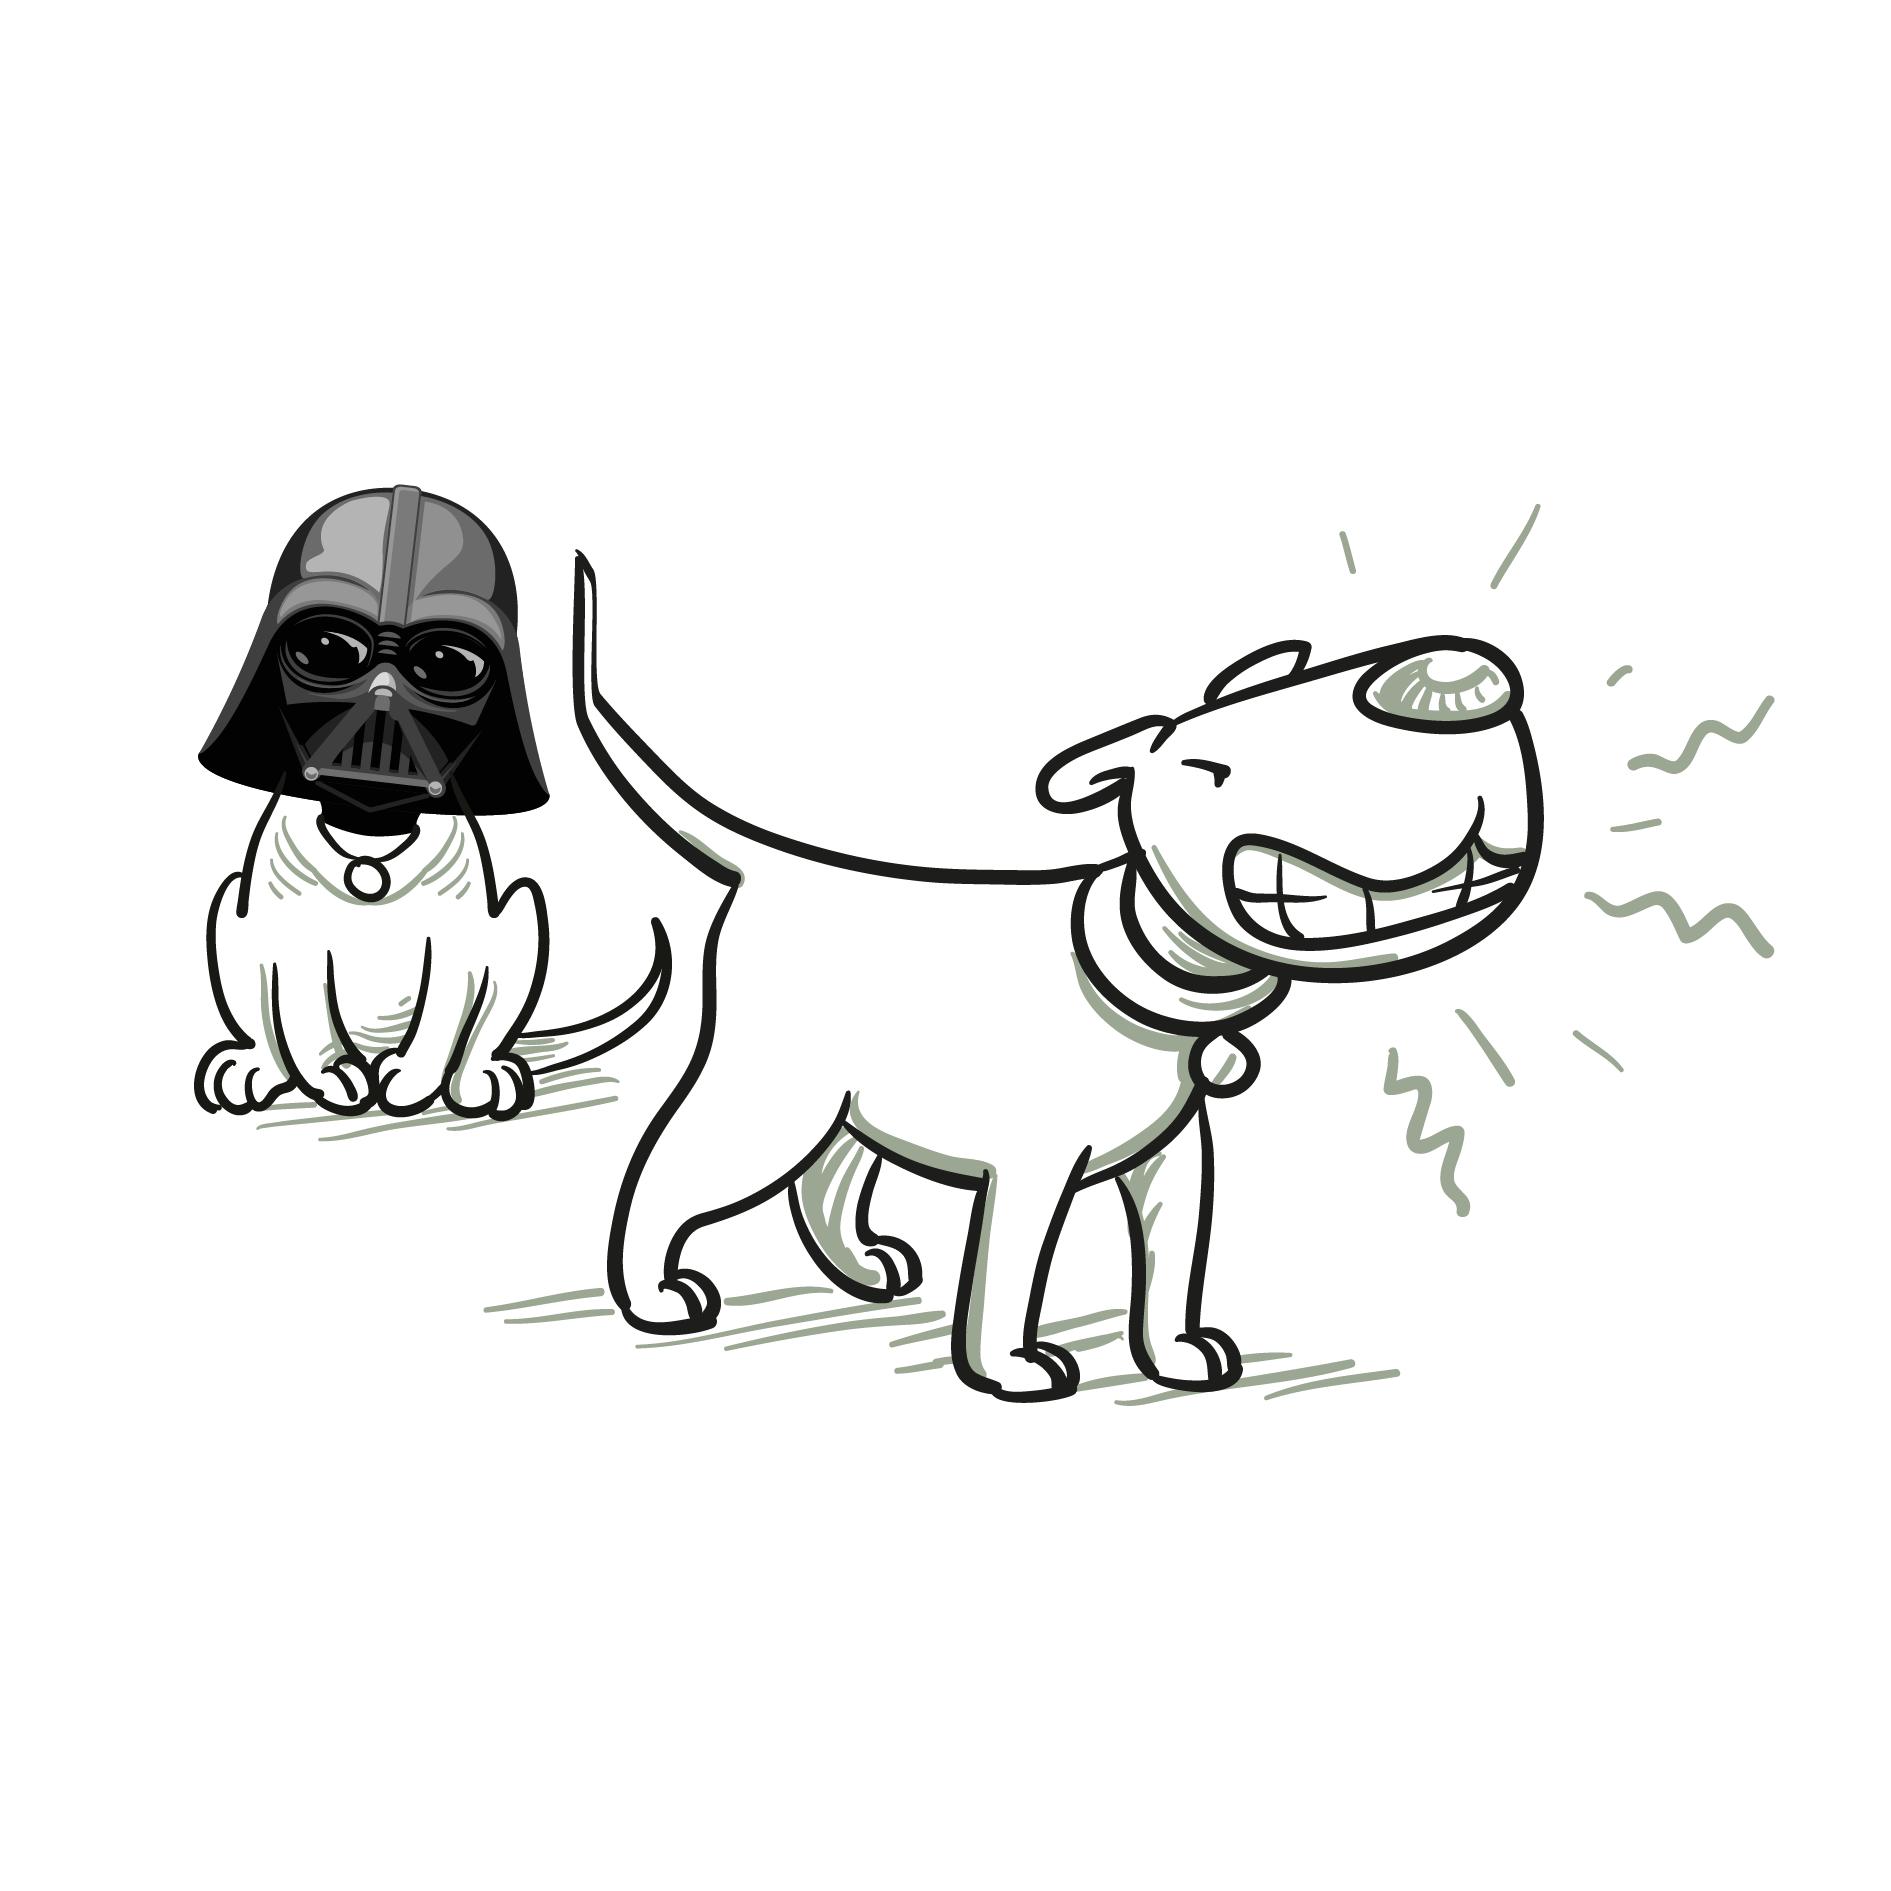 Hundeclique_Darth-Vader